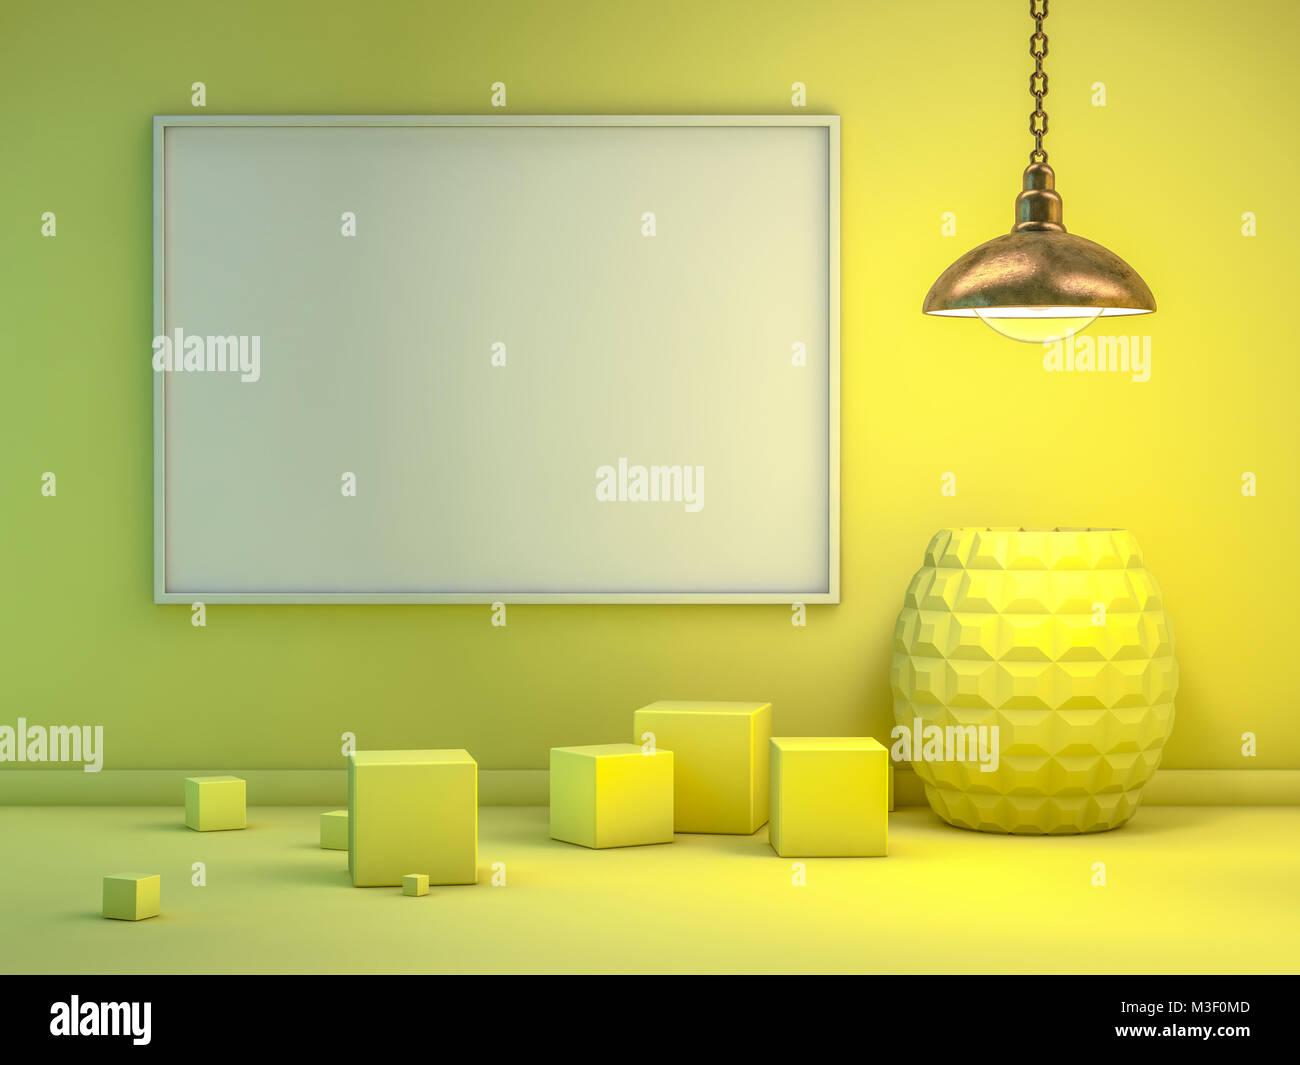 Poster mit Rahmen Mockup im Inneren. 3D-Rendering Stockfoto, Bild ...